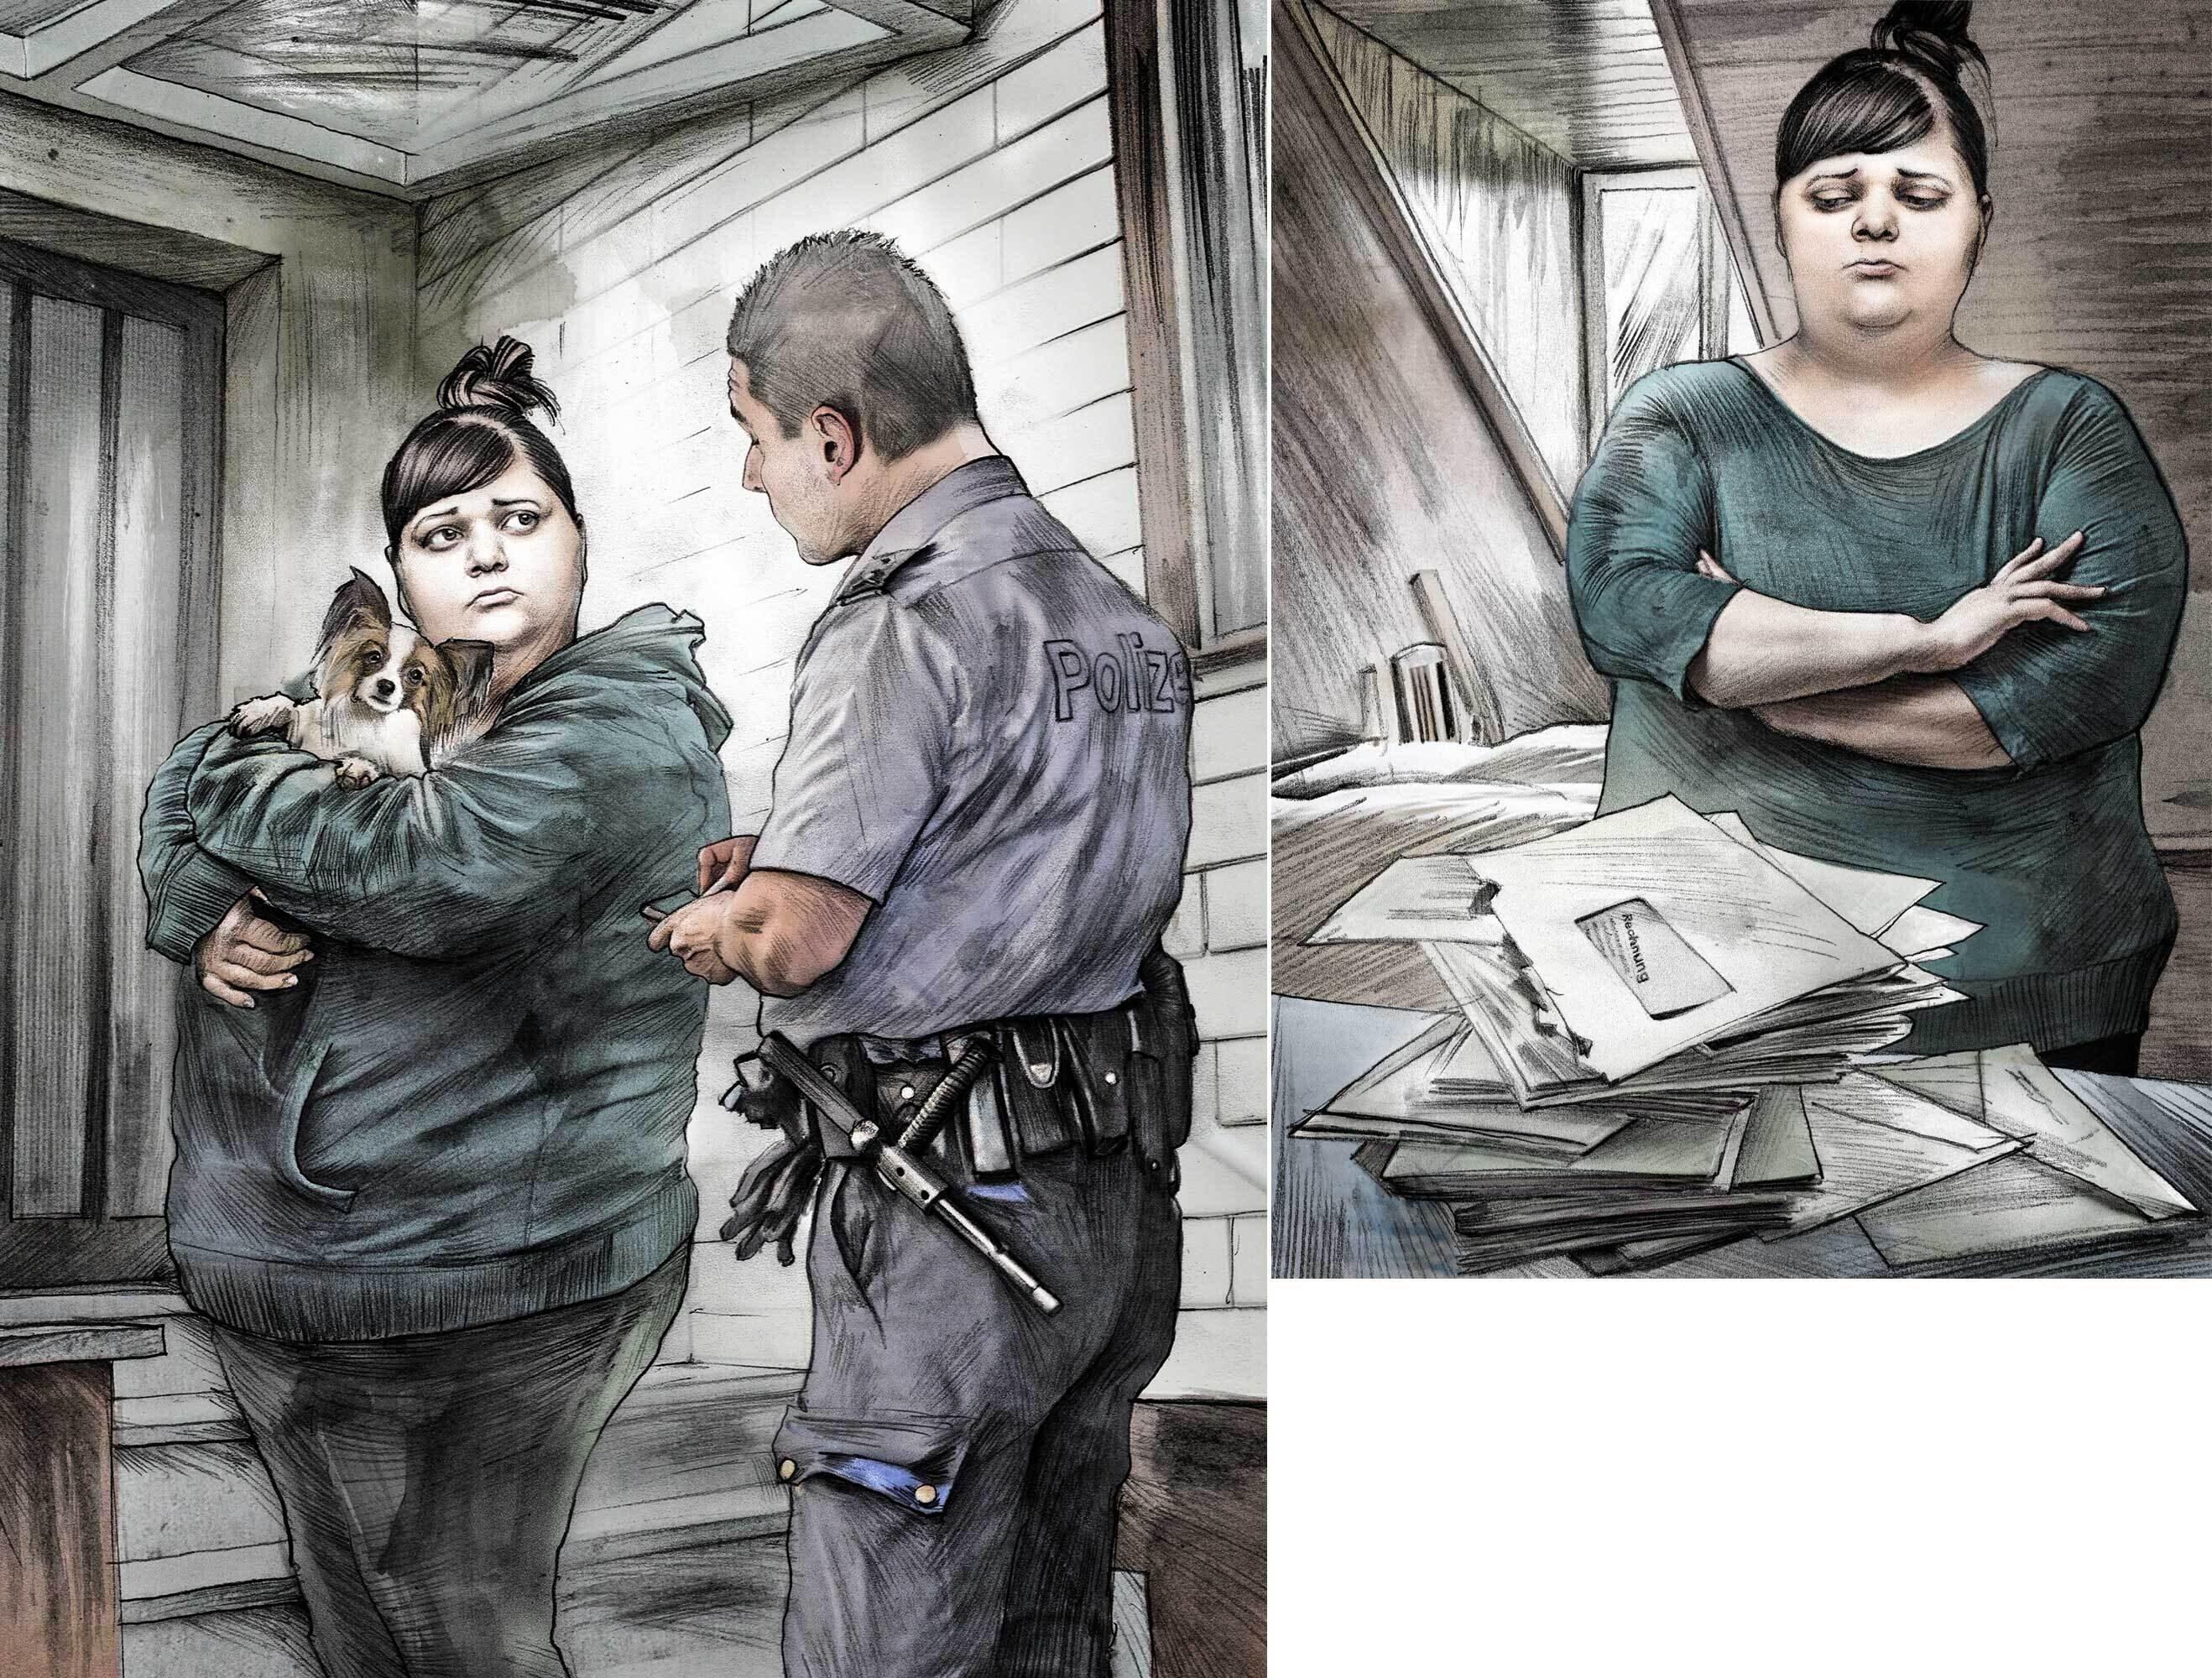 Illustration polizei schulden - Kornel Illustration   Kornel Stadler portfolio